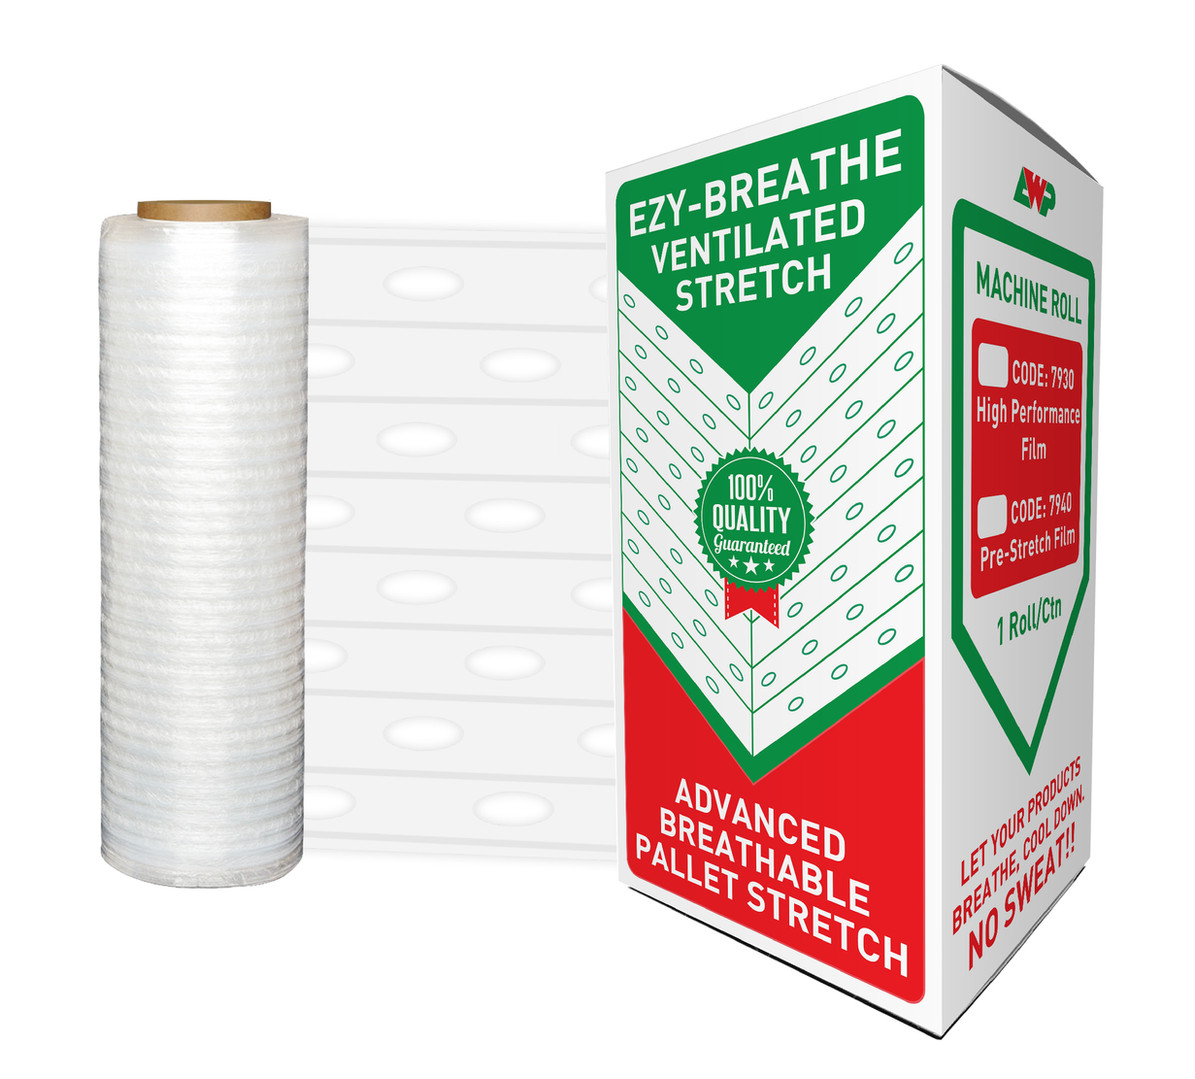 Ezy-Breathe Ventilated_3D.jpg